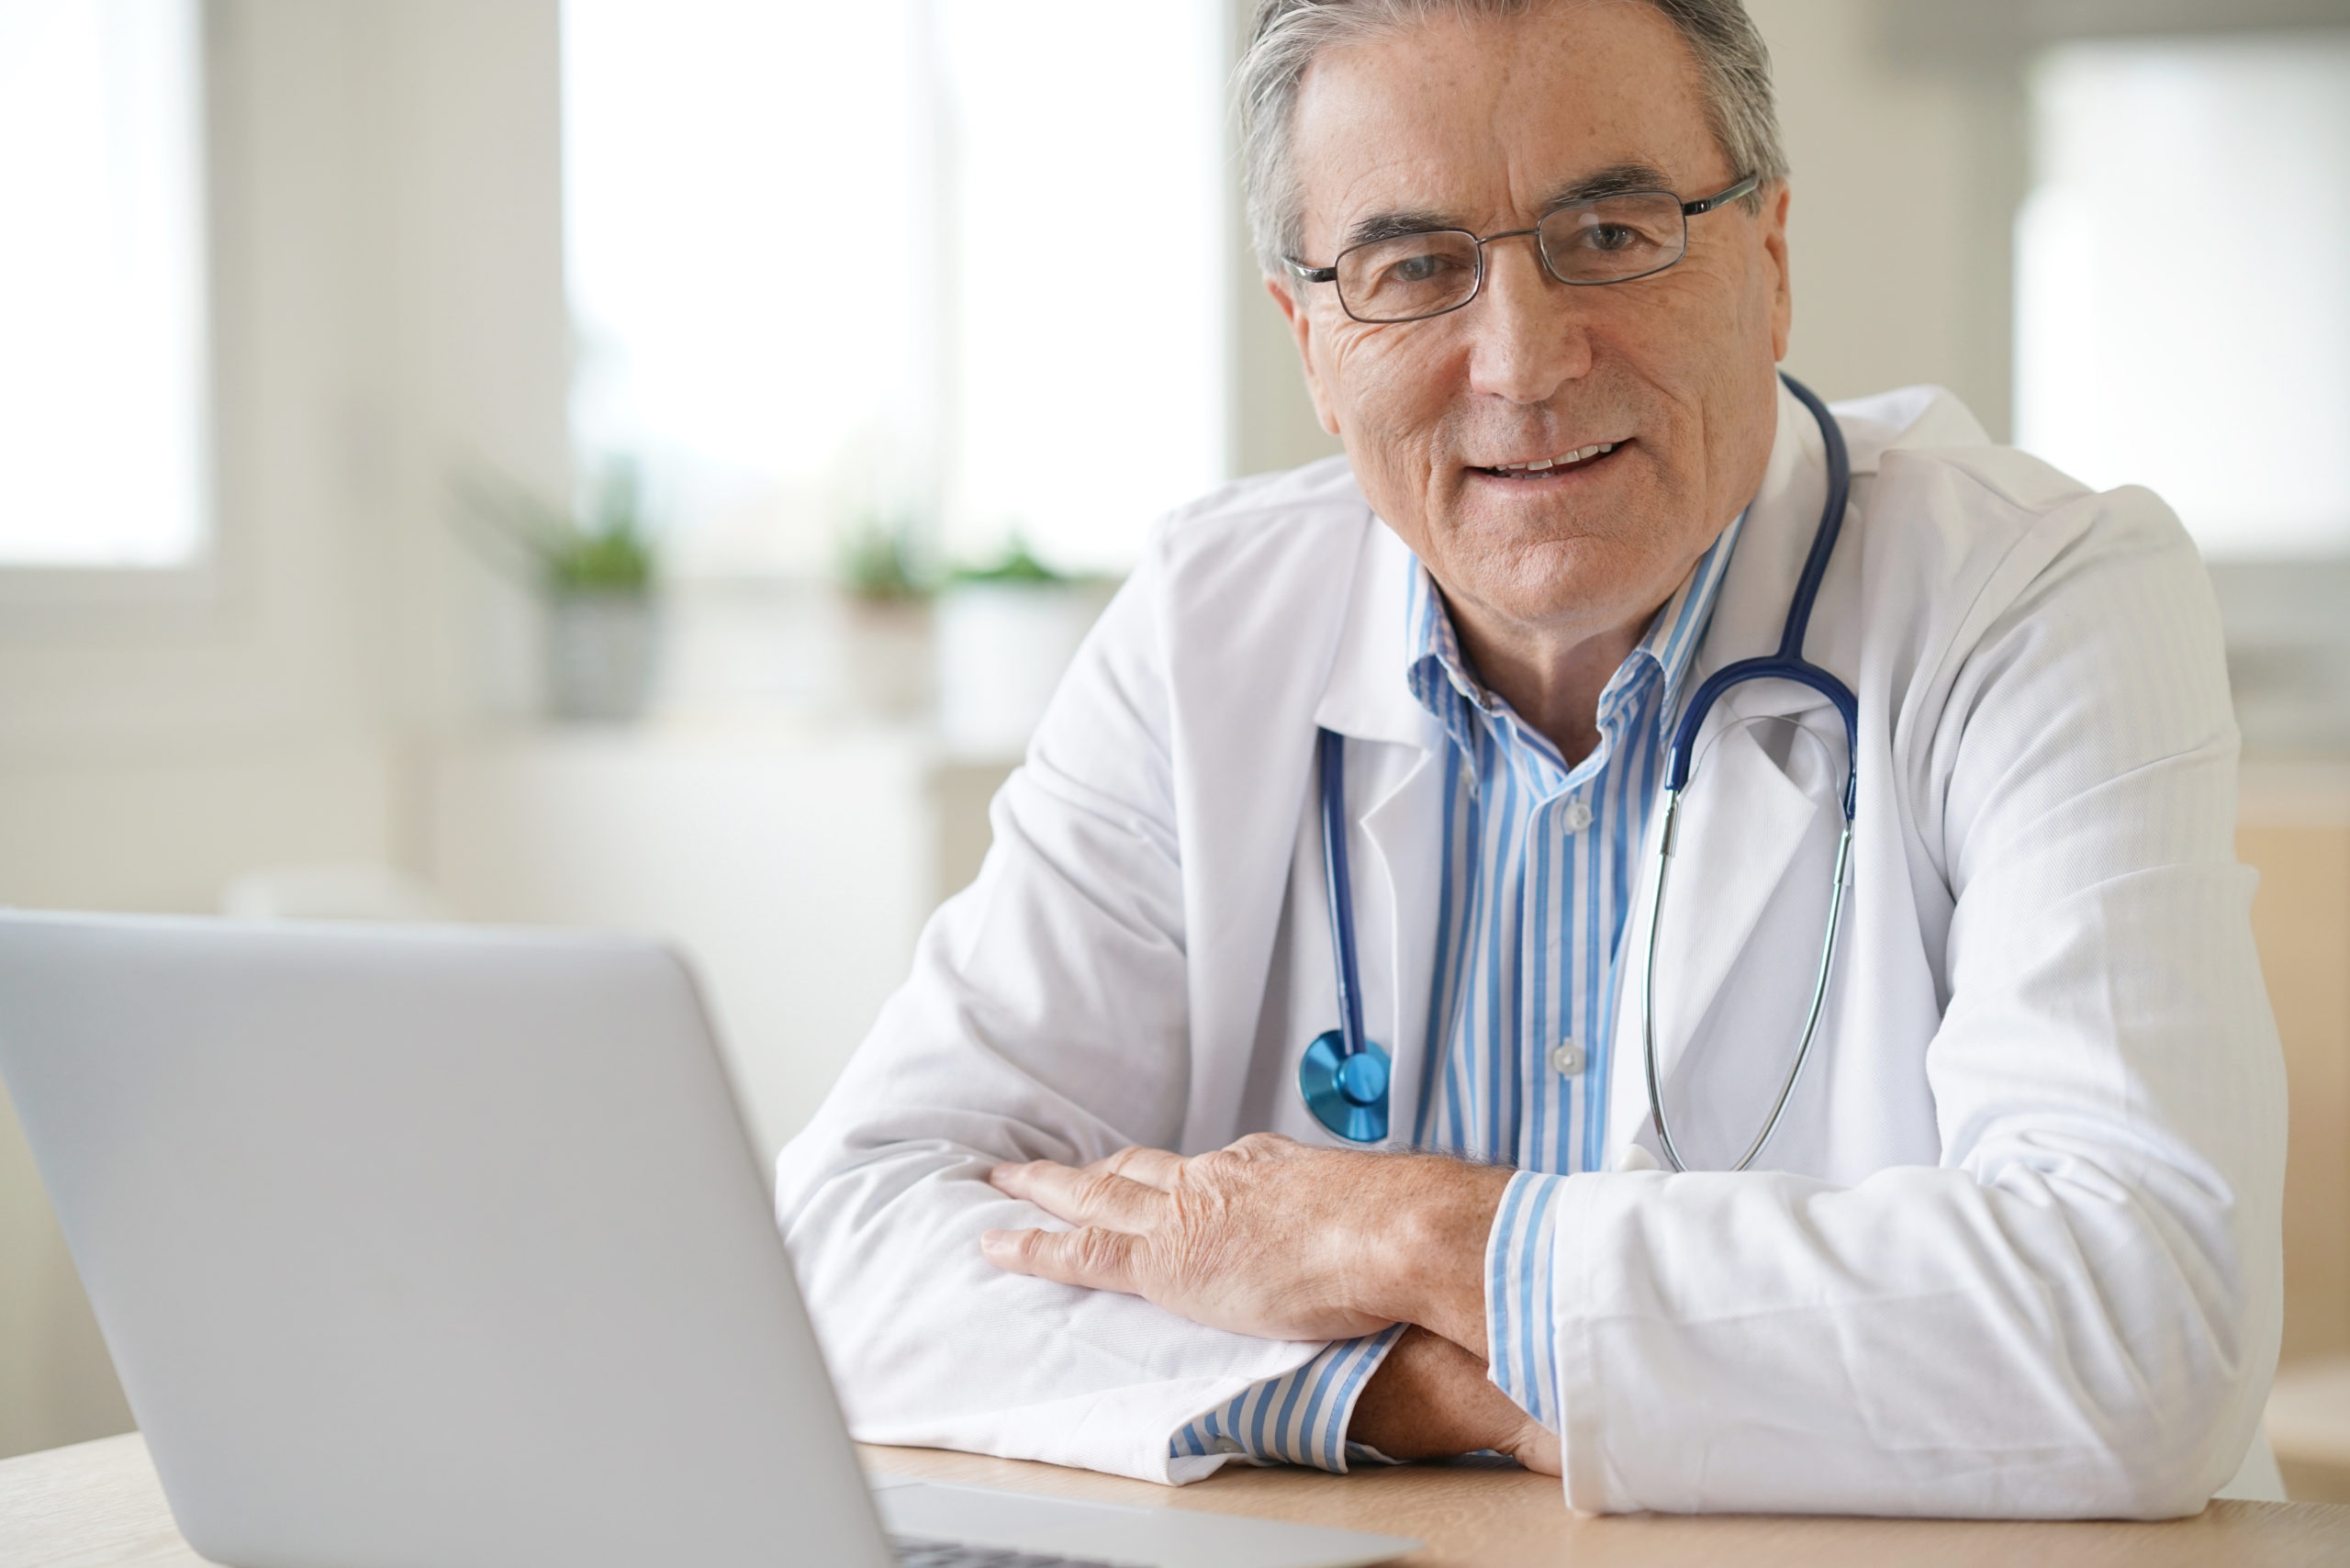 Arztbrief / wypis lekarski